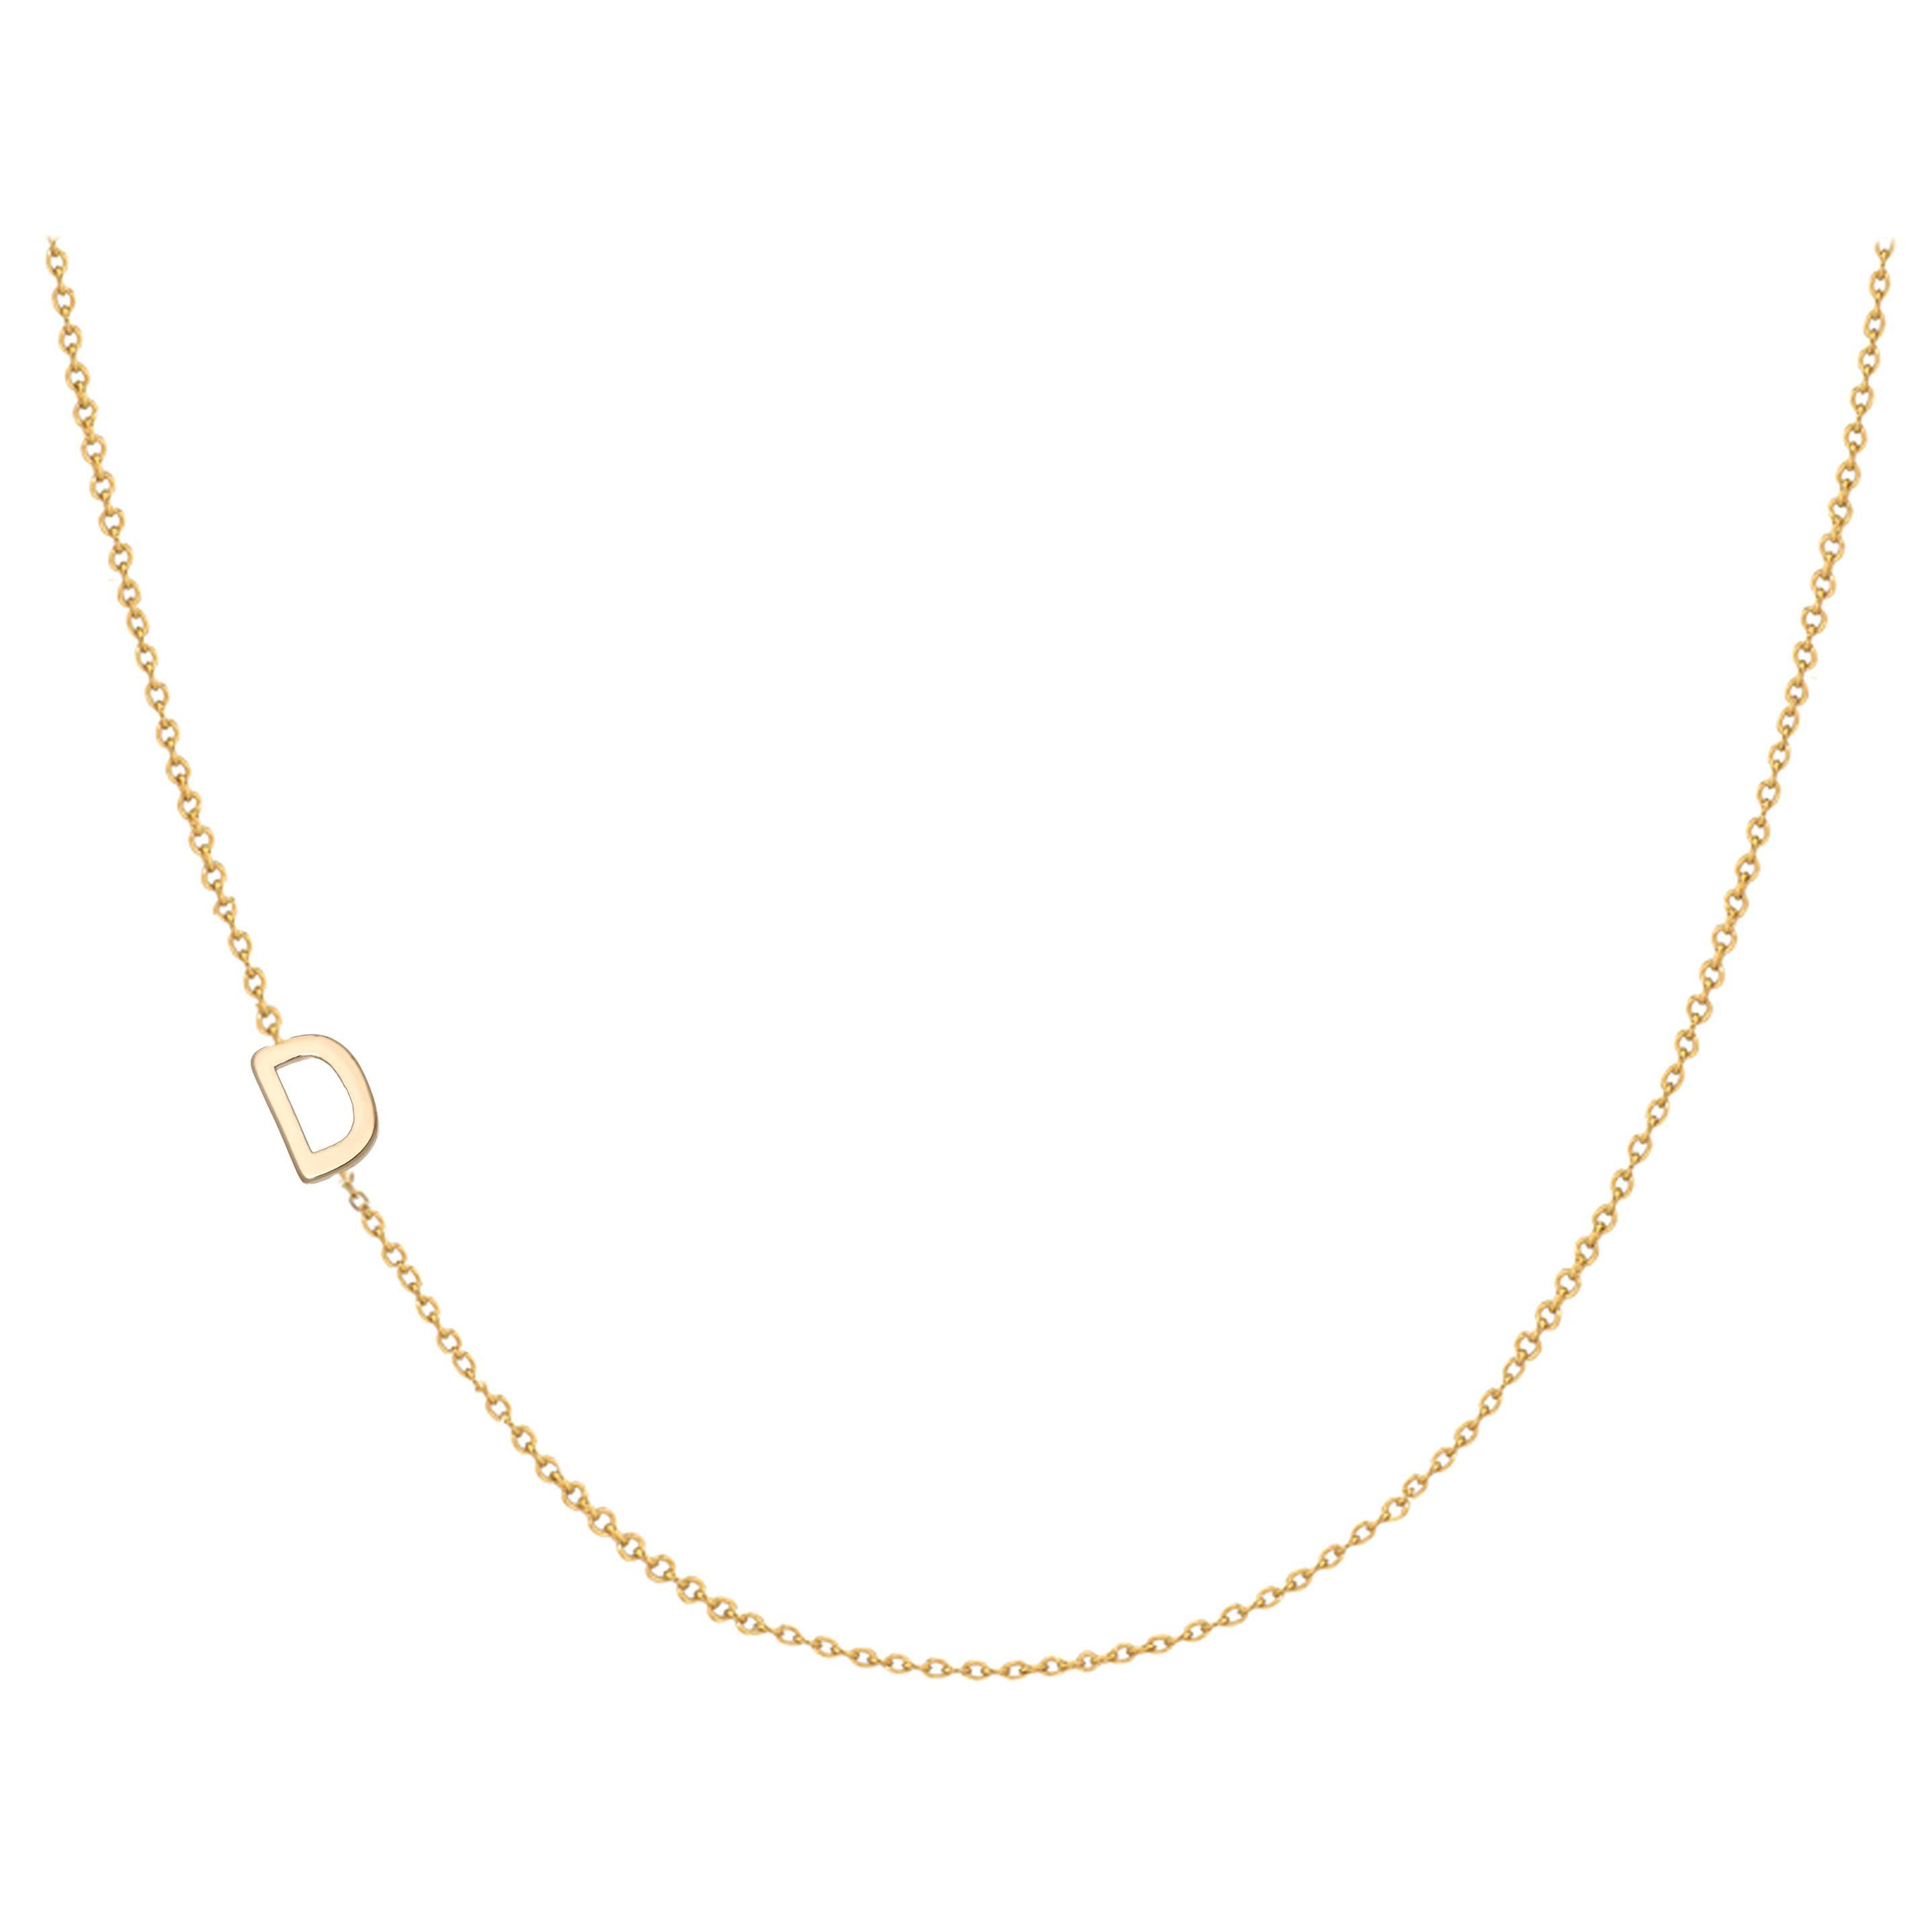 14 Karat Gold Asymmetrical Initial Necklace, D